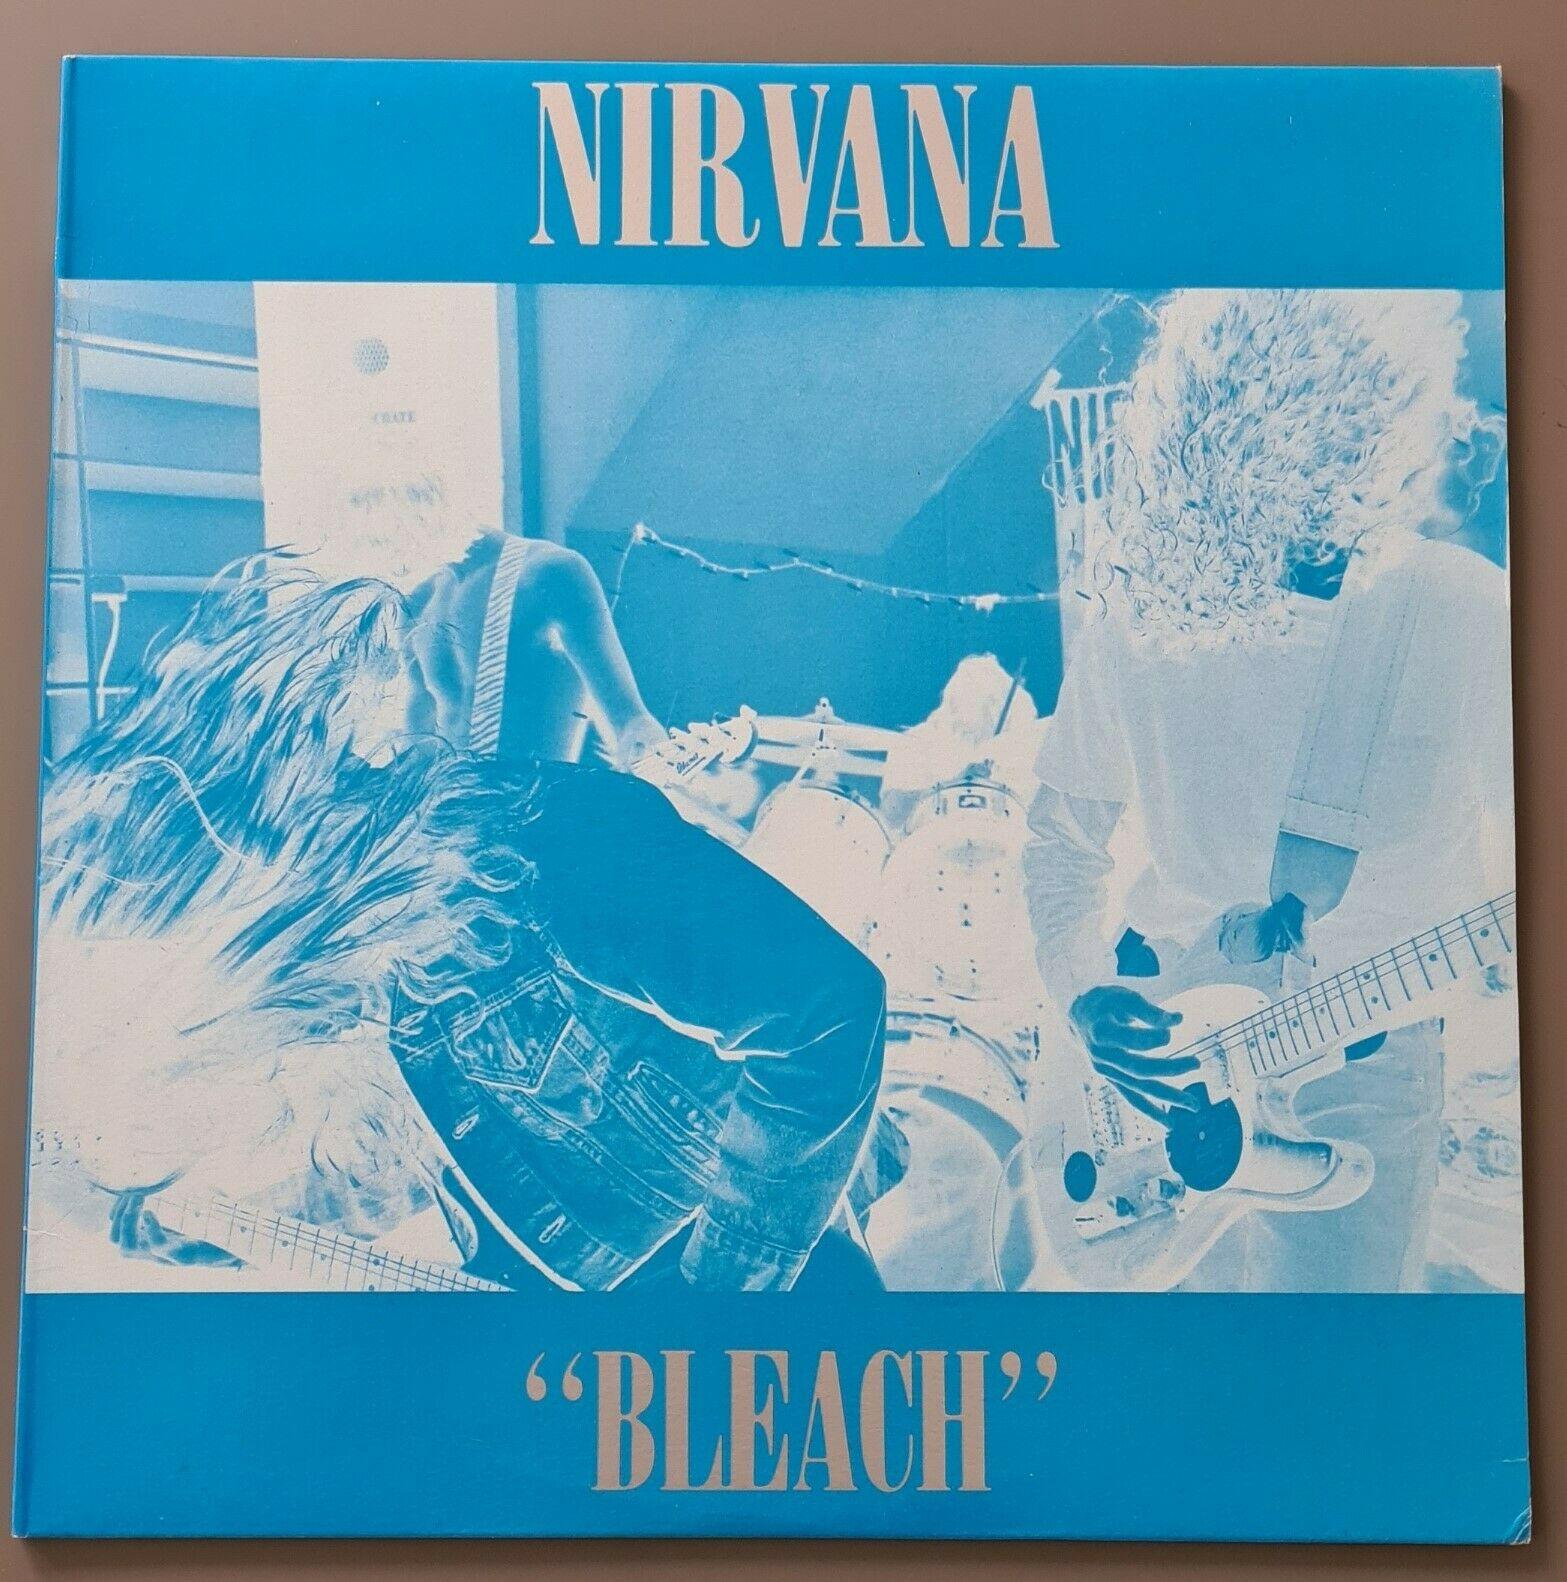 Nirvana - Bleach  Waterfront Records – DAMP 114  Blue Vinyl, Blue / Silver Sleev